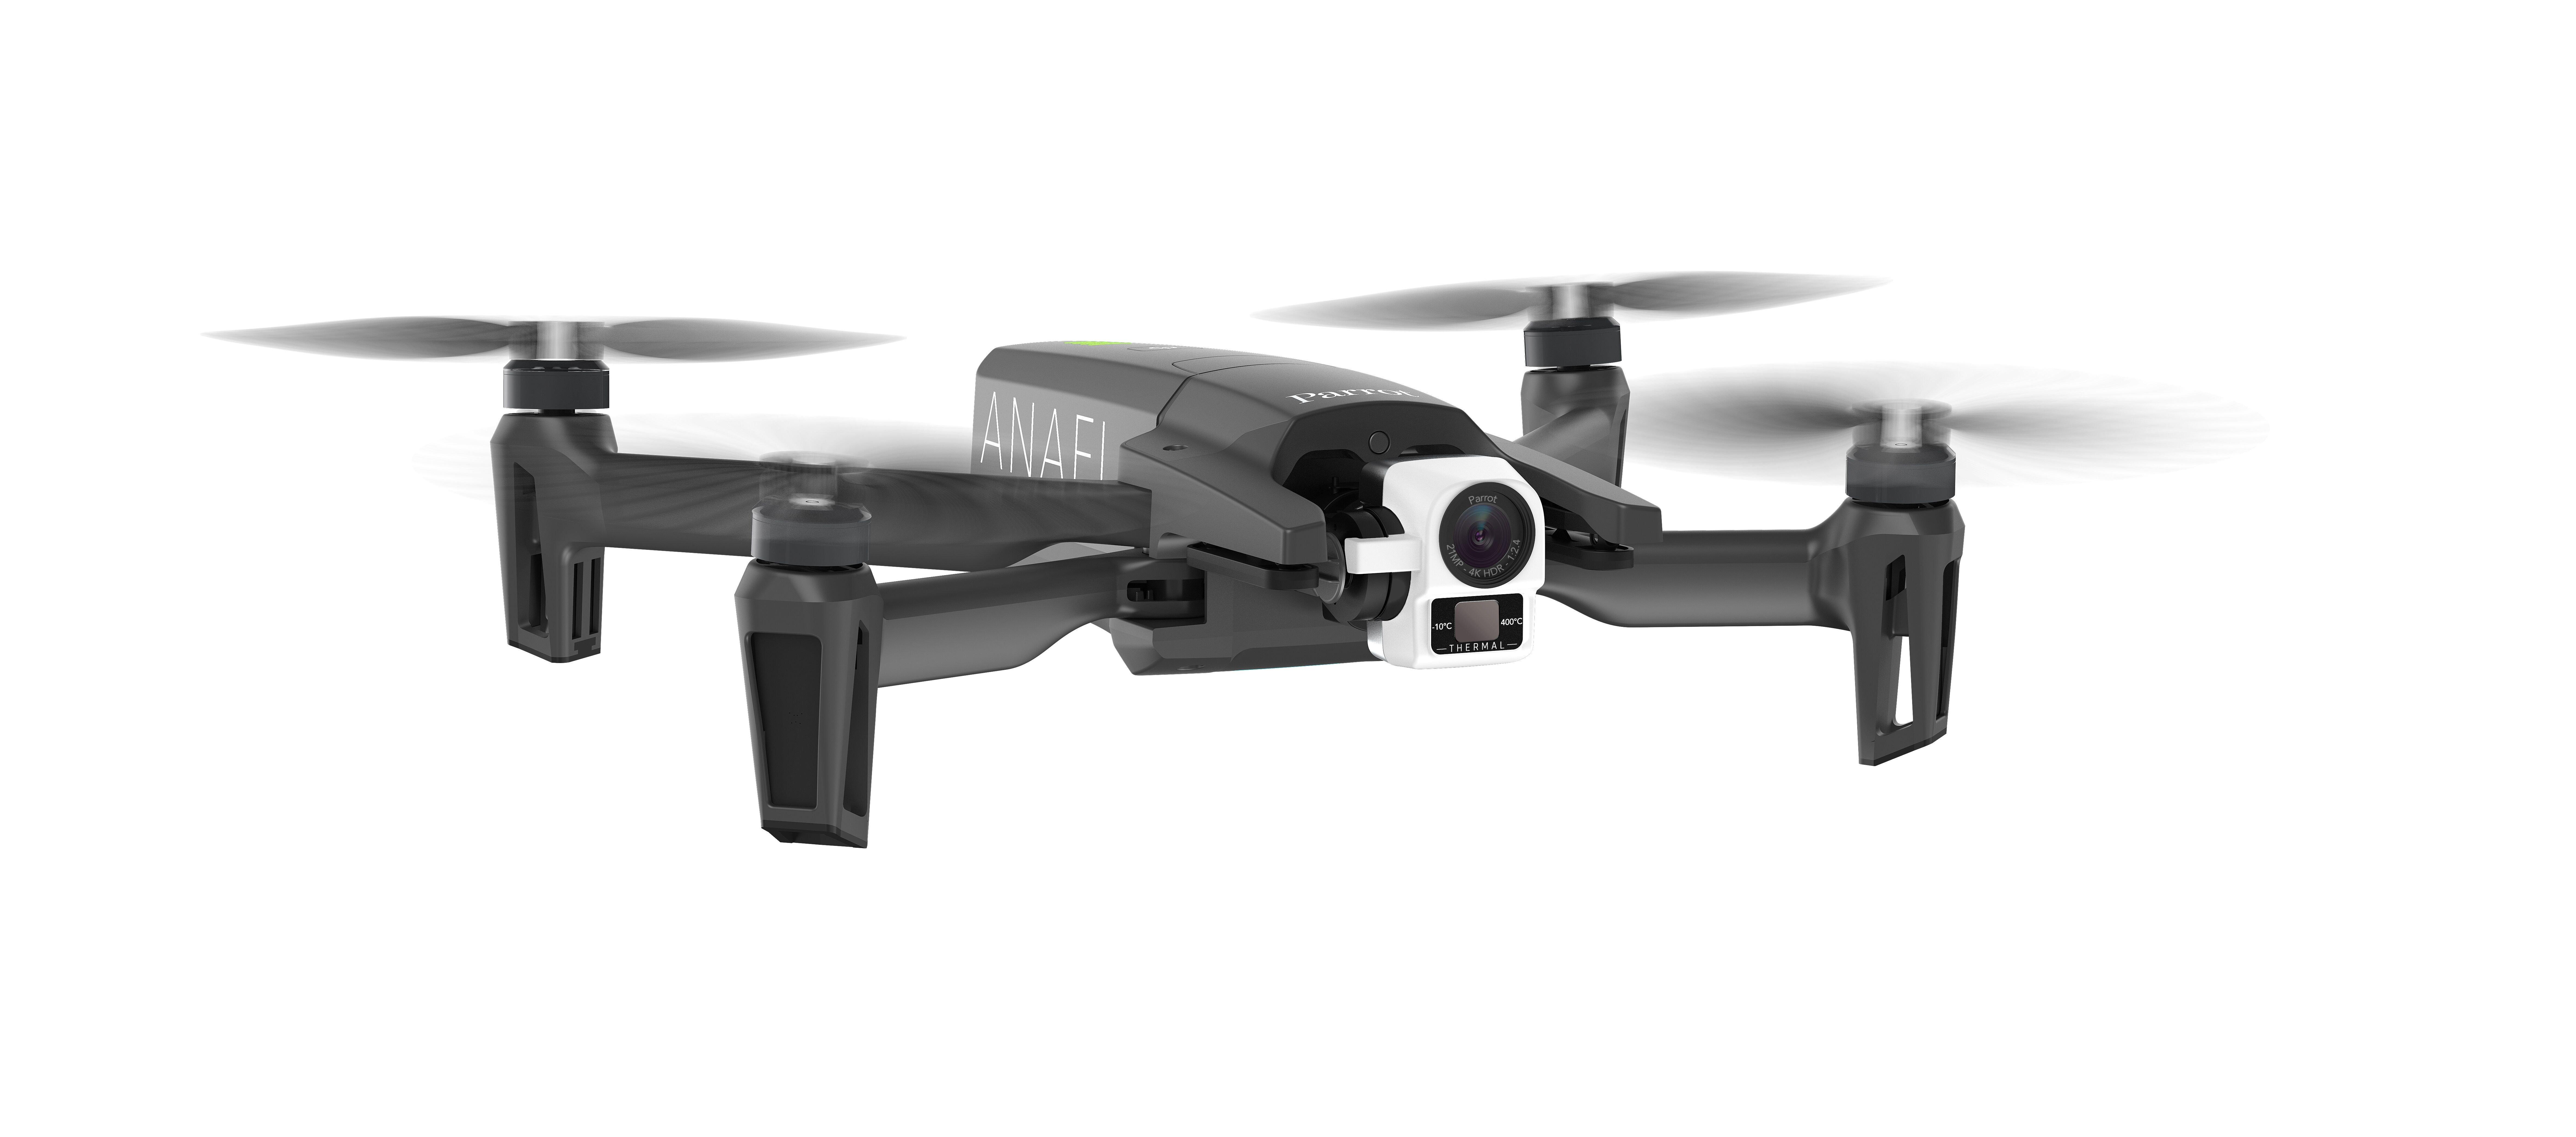 the anafi thermal drone